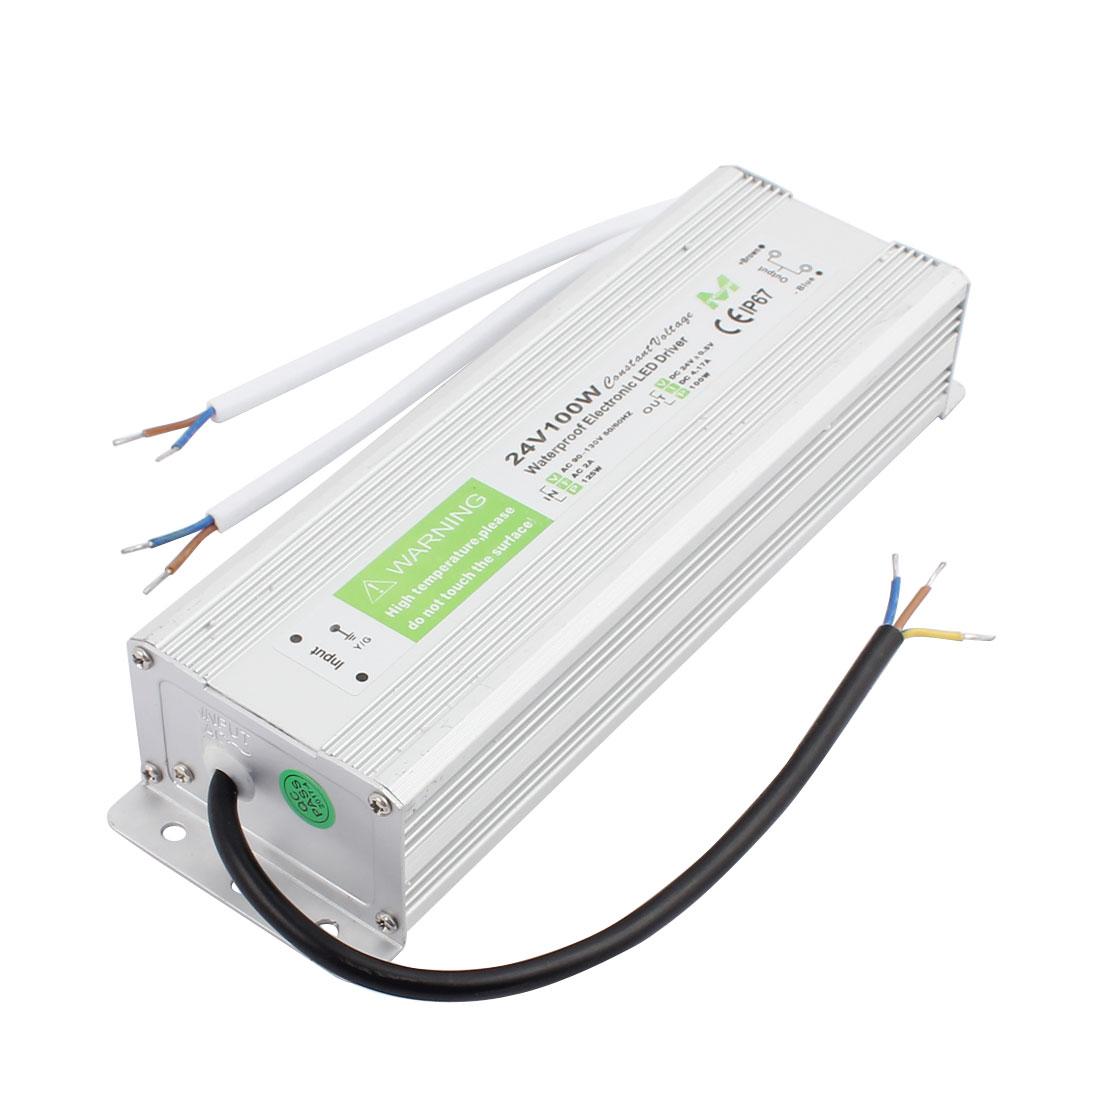 AC90~130V to DC 24V 100 Watt Transformer IP67 Waterproof LED Driver Power Supply